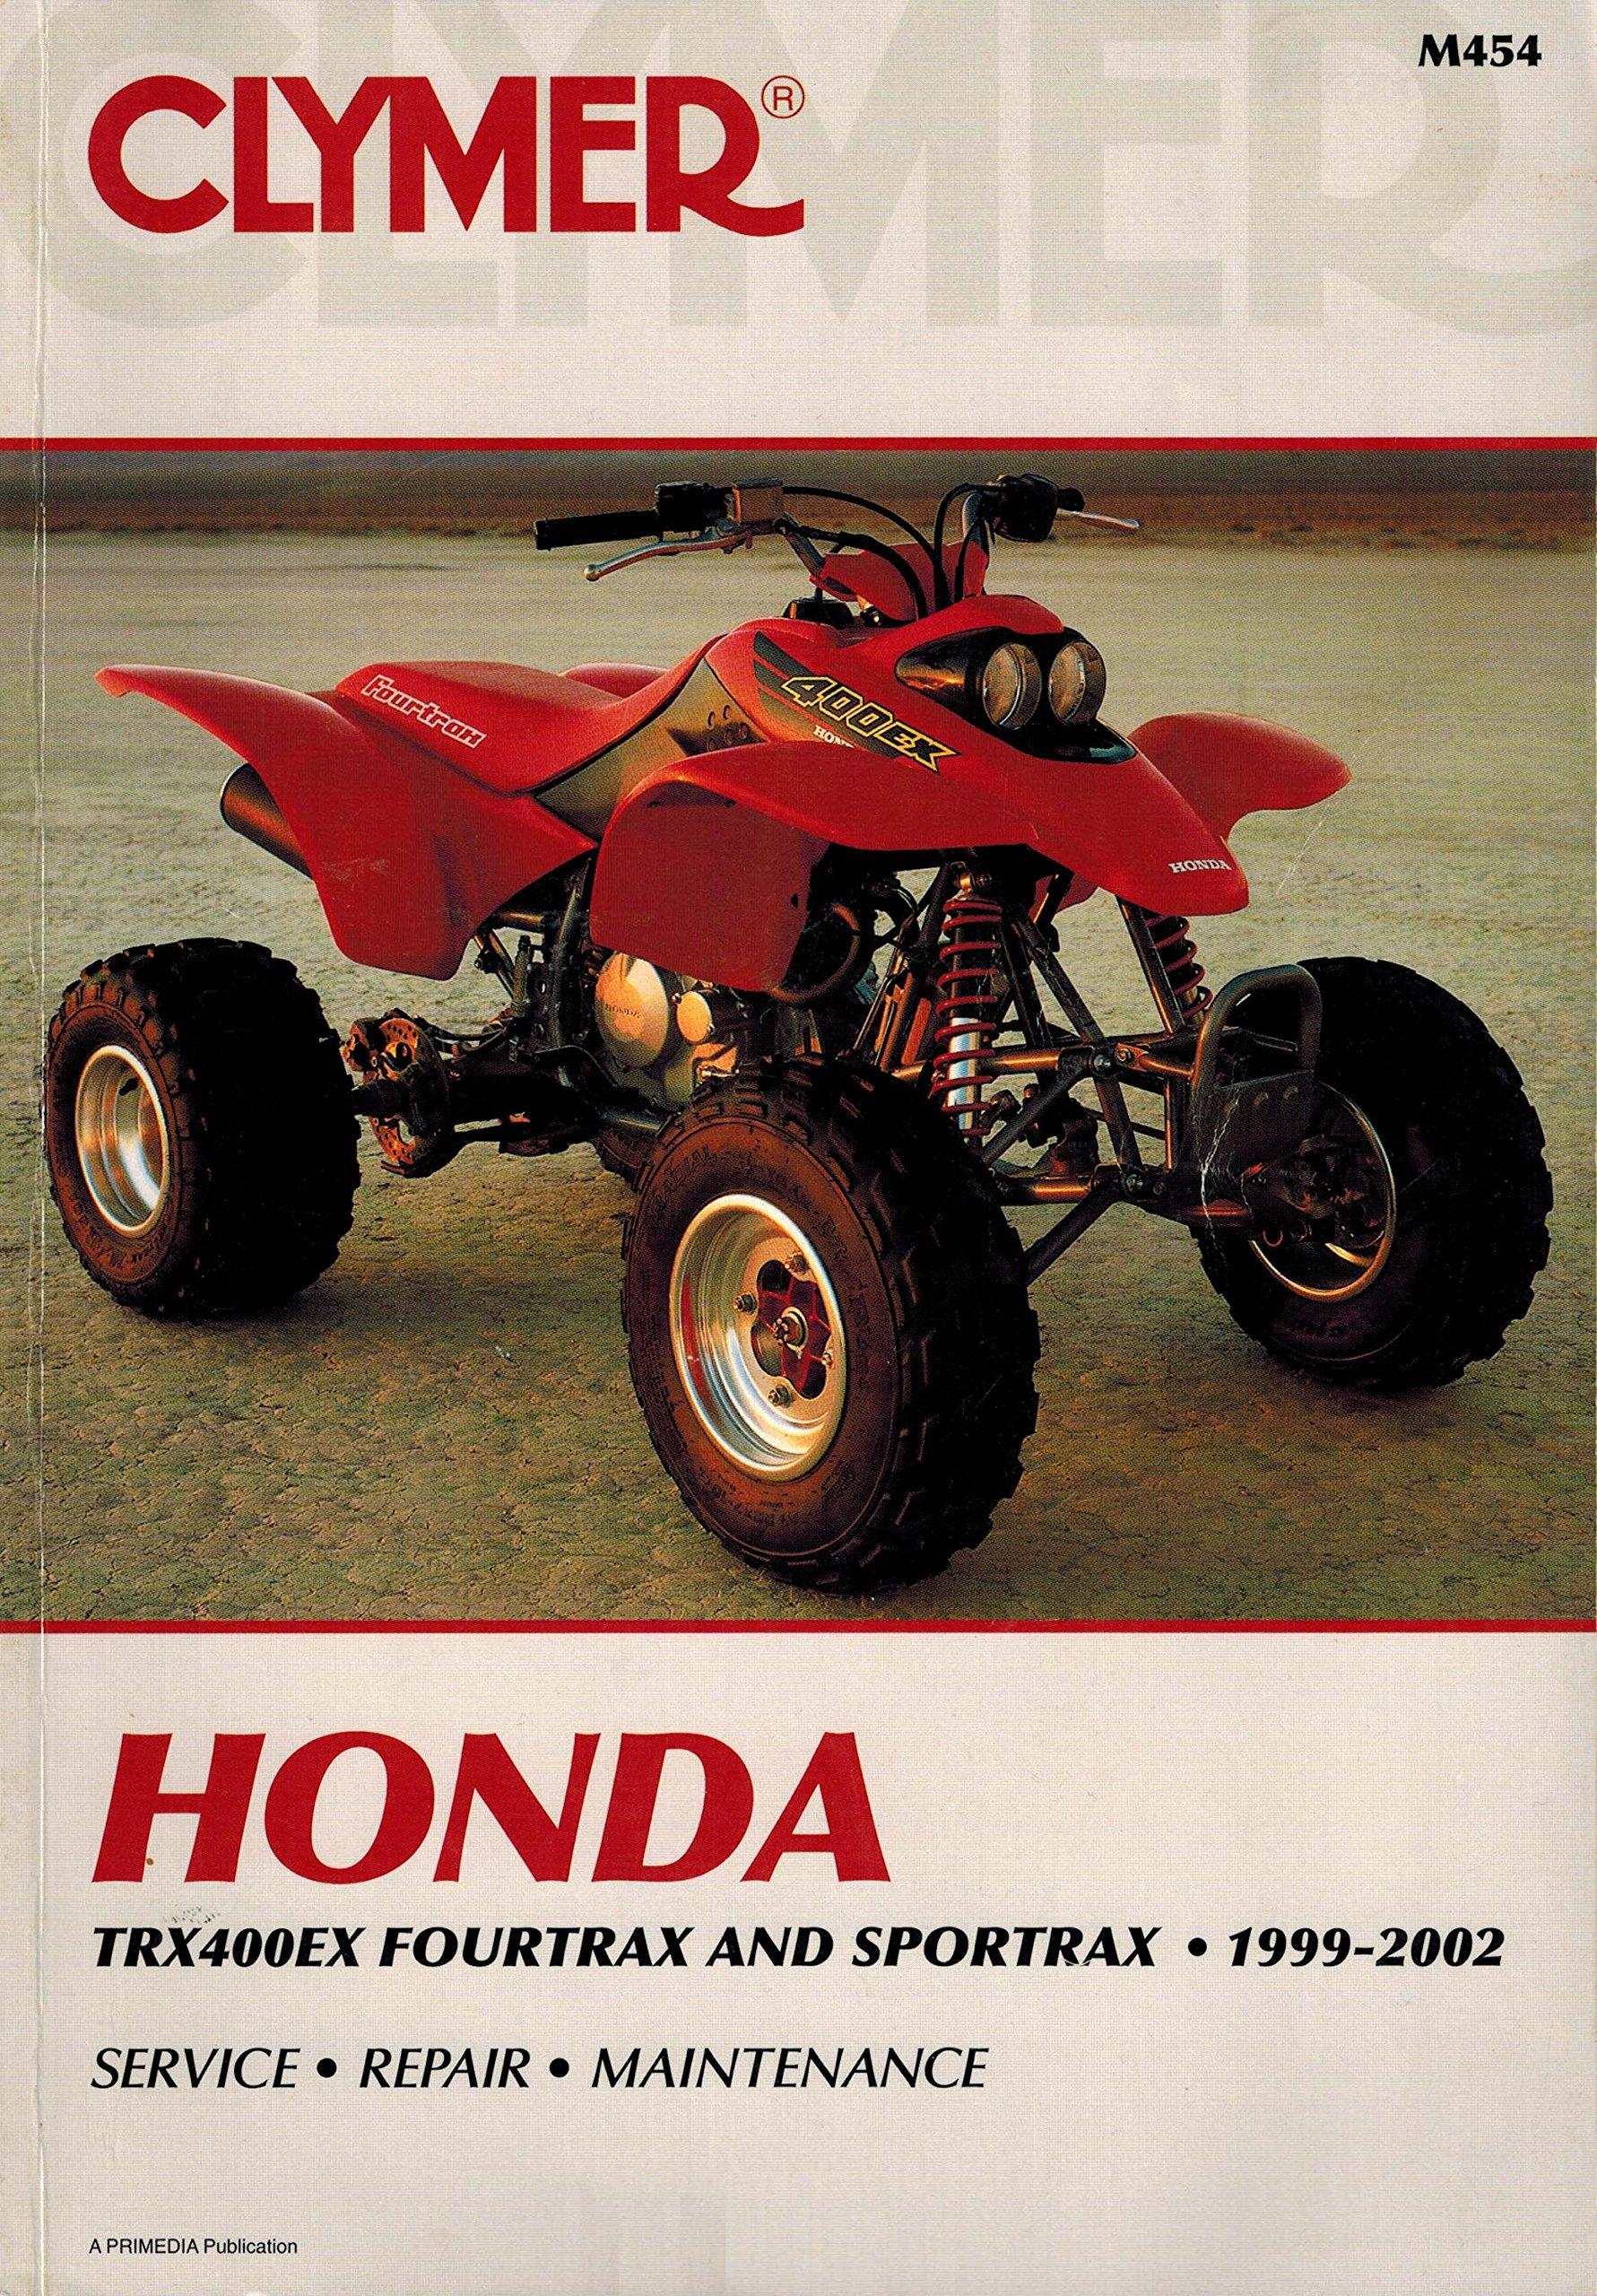 Clymer Honda Trx400ex Fourtrax and Sportrax, 1999-2002: Jay Bogart, Tim  Bergland: 9780892877799: Amazon.com: Books